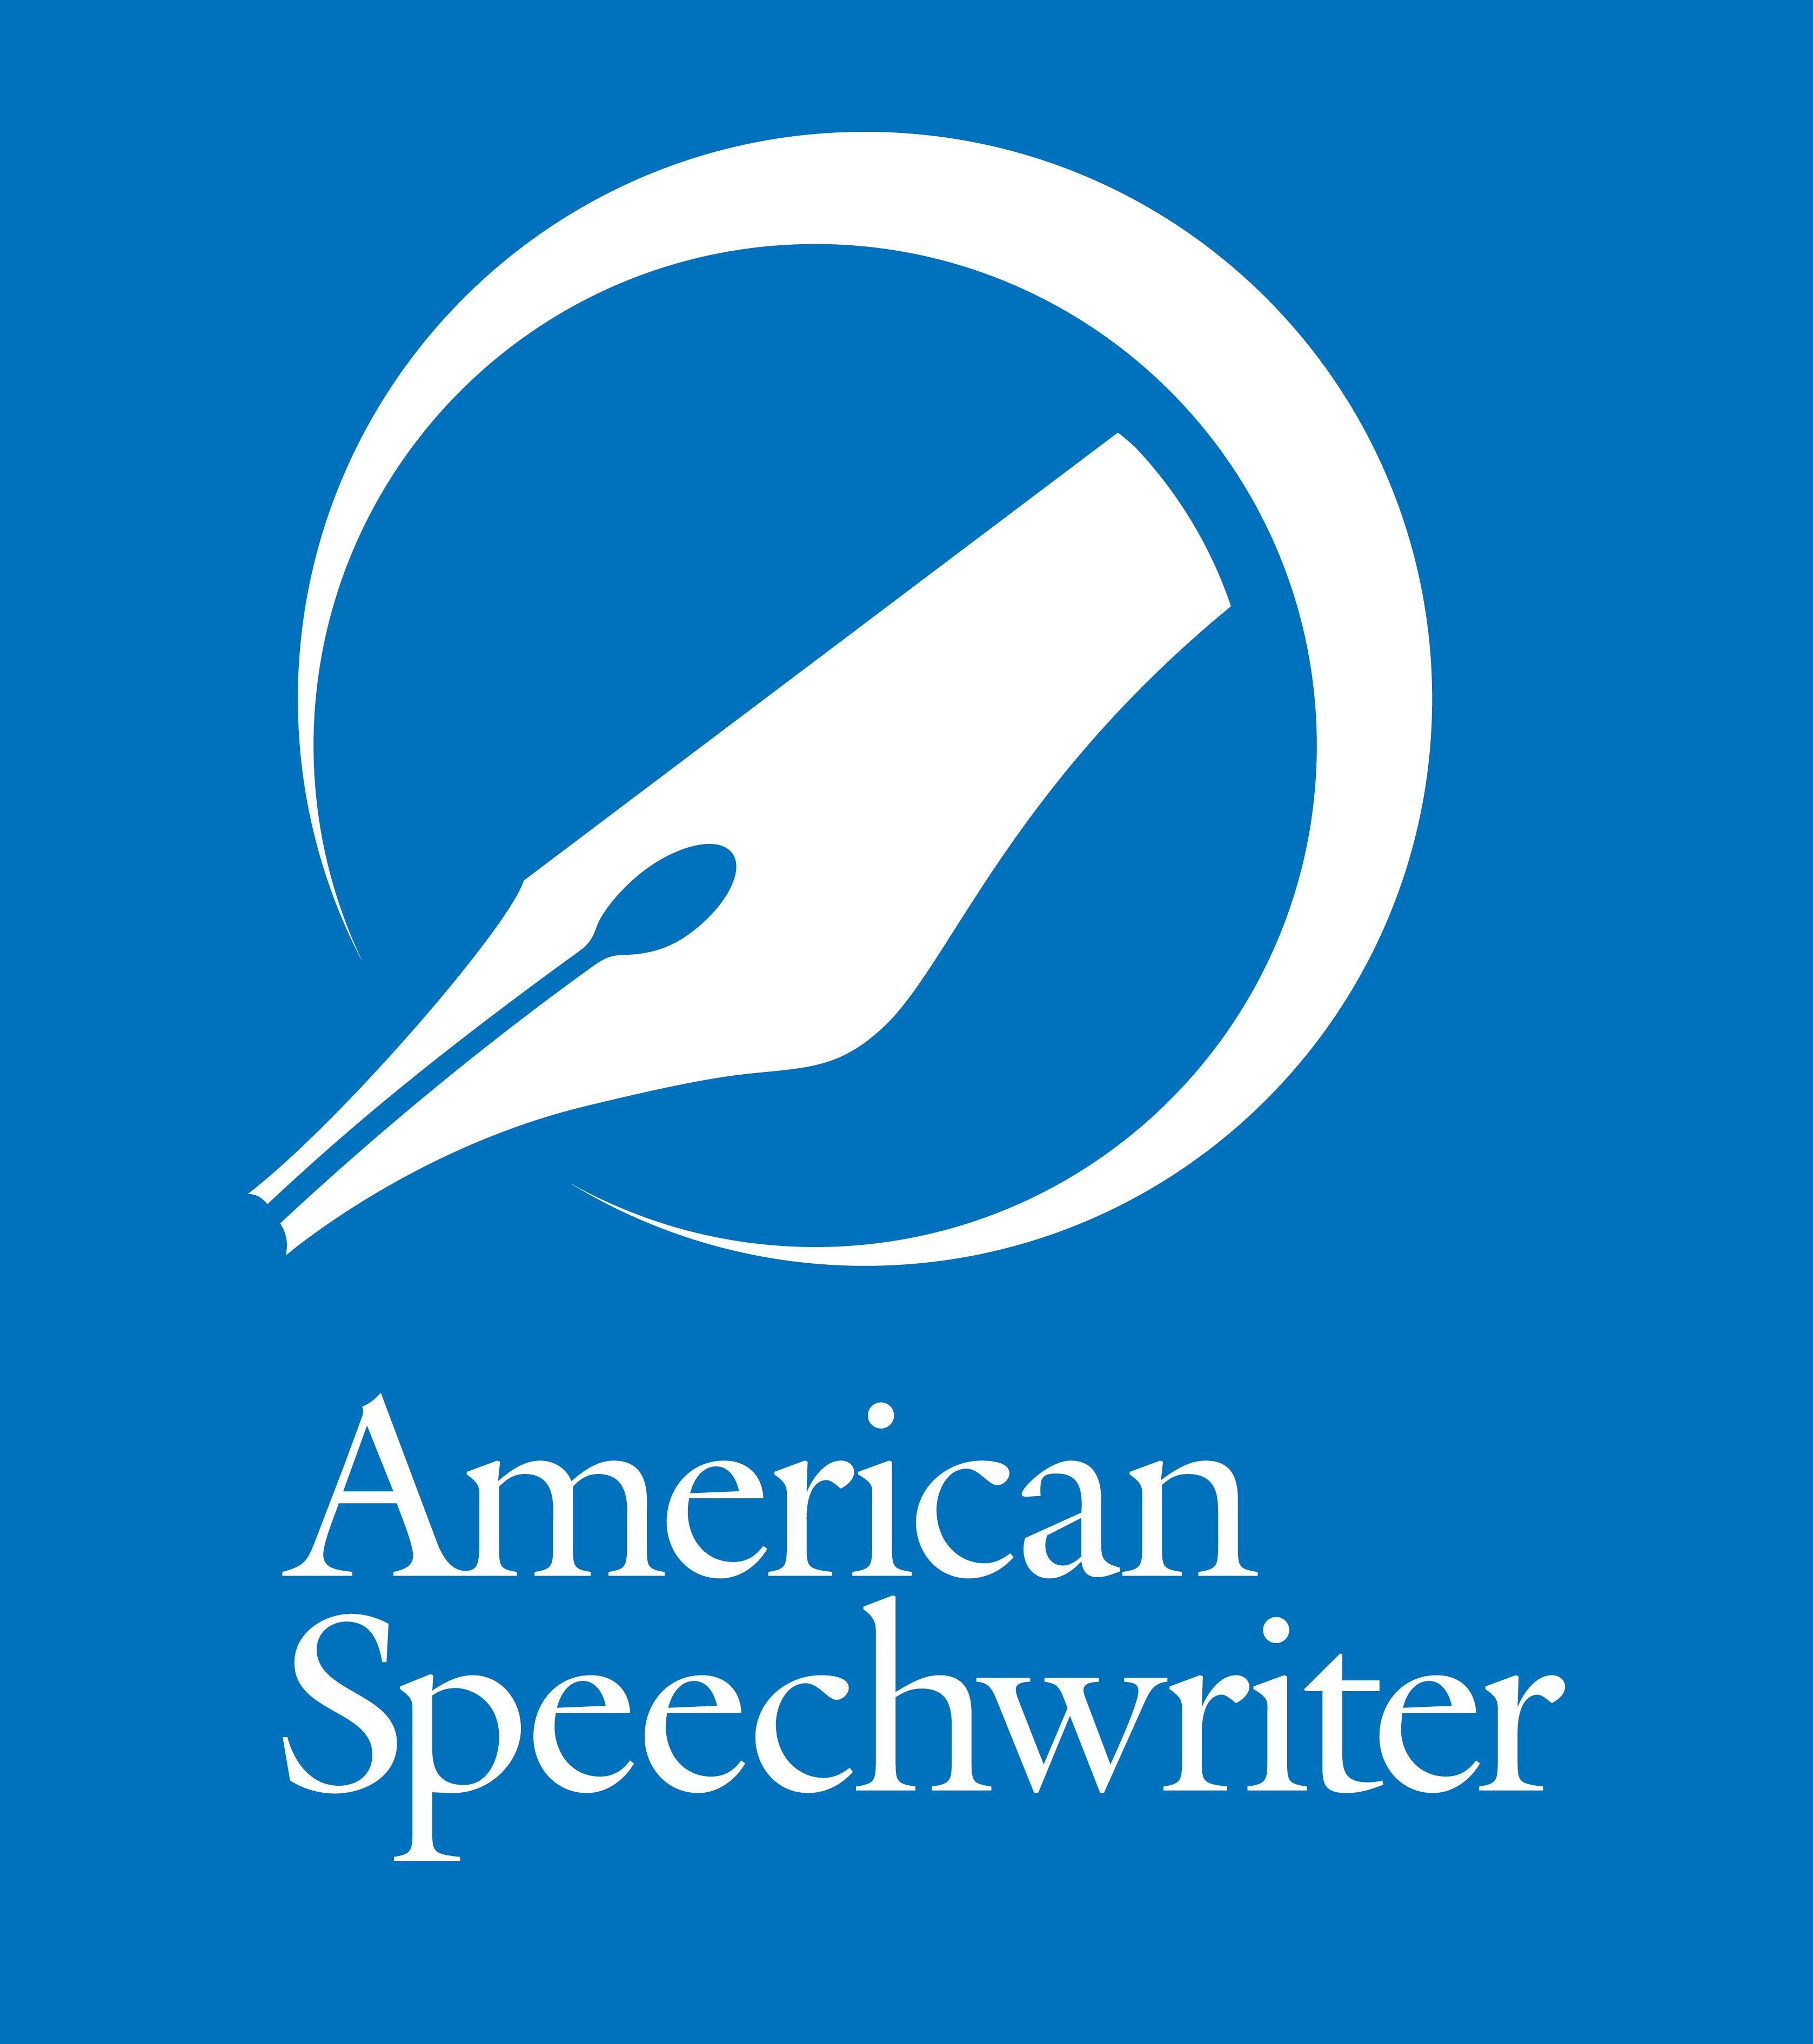 American Speechwriter Logo